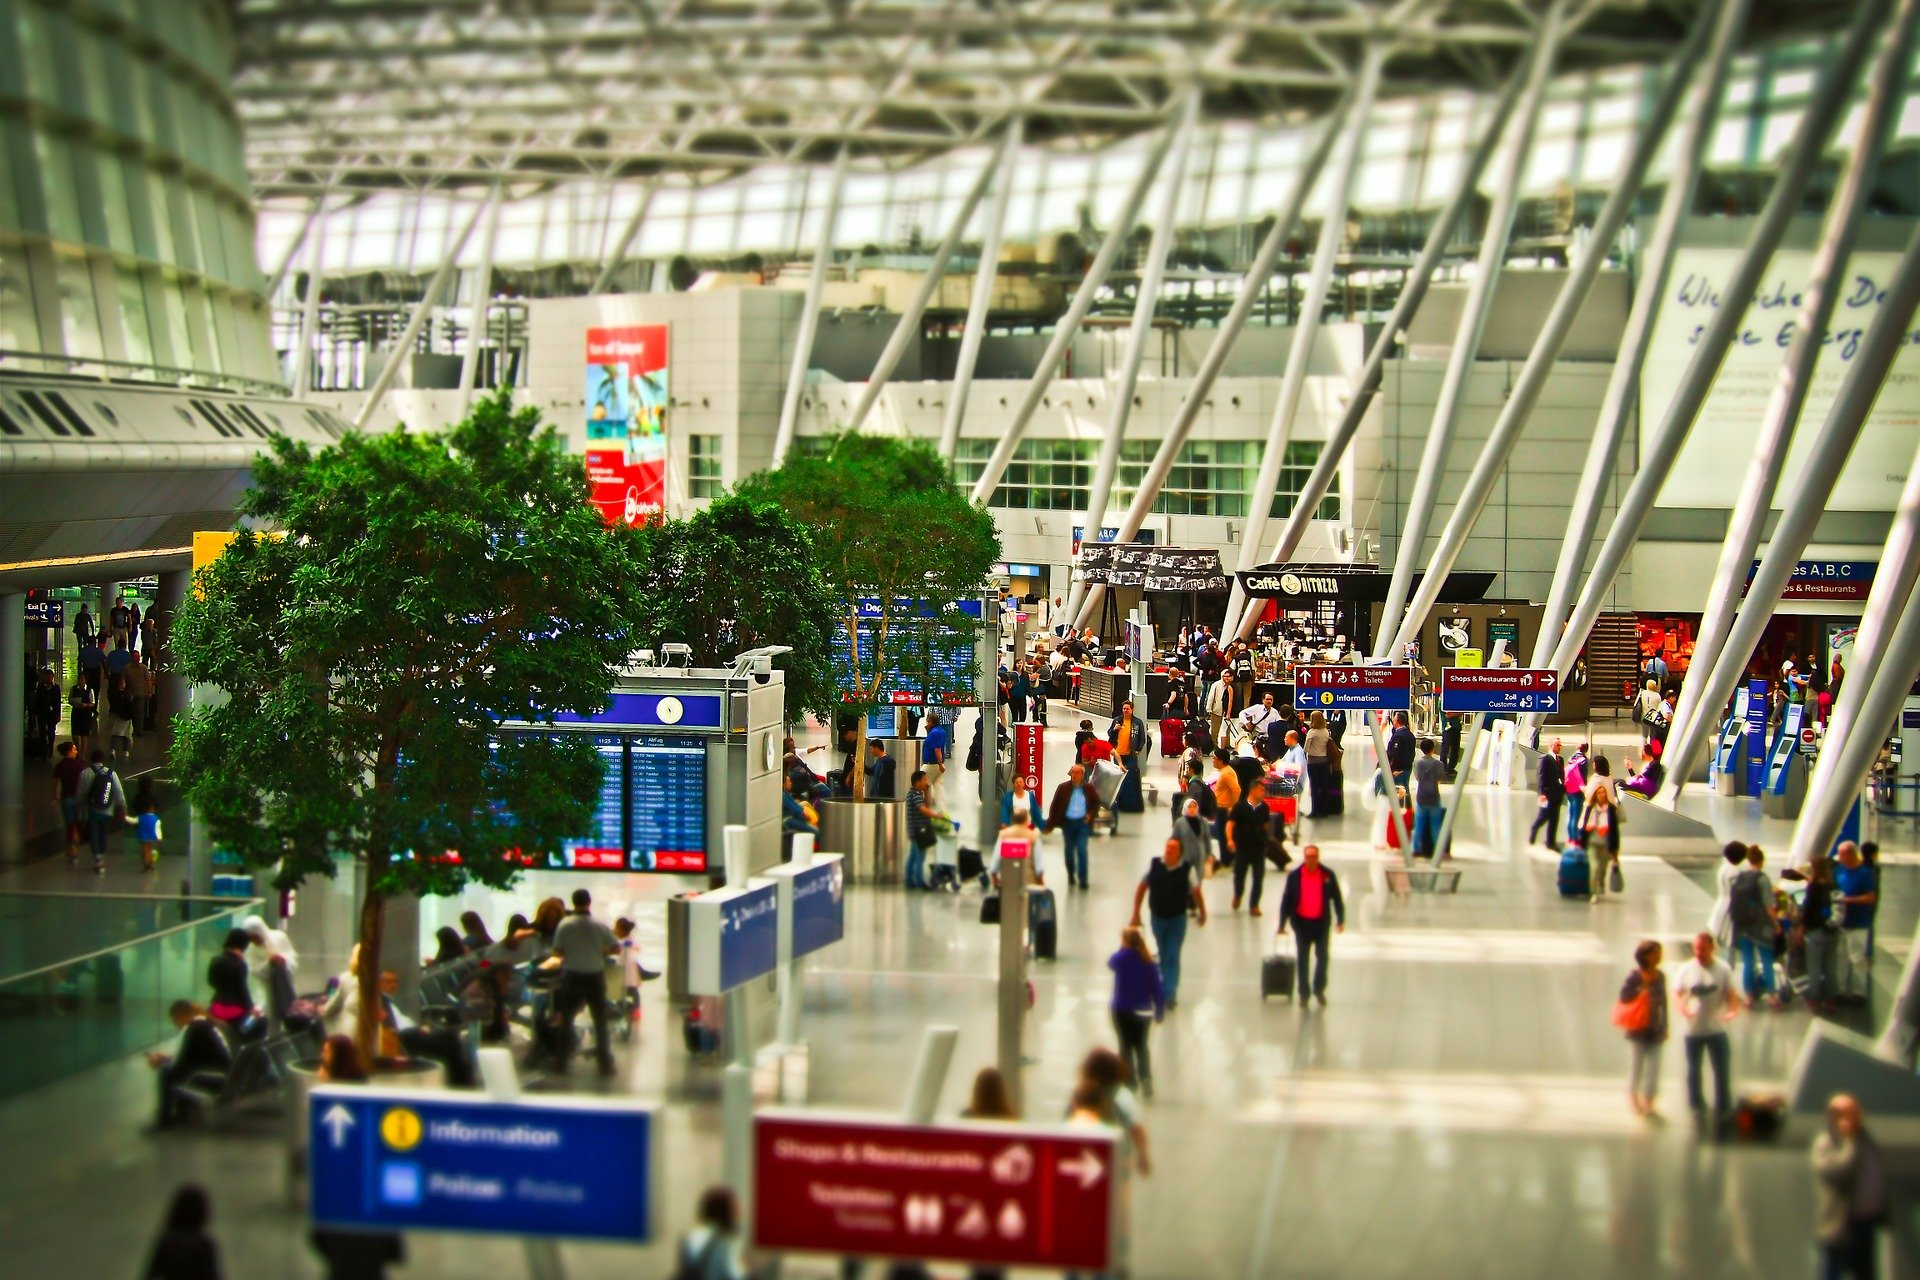 aeropuerto, gente, maletas